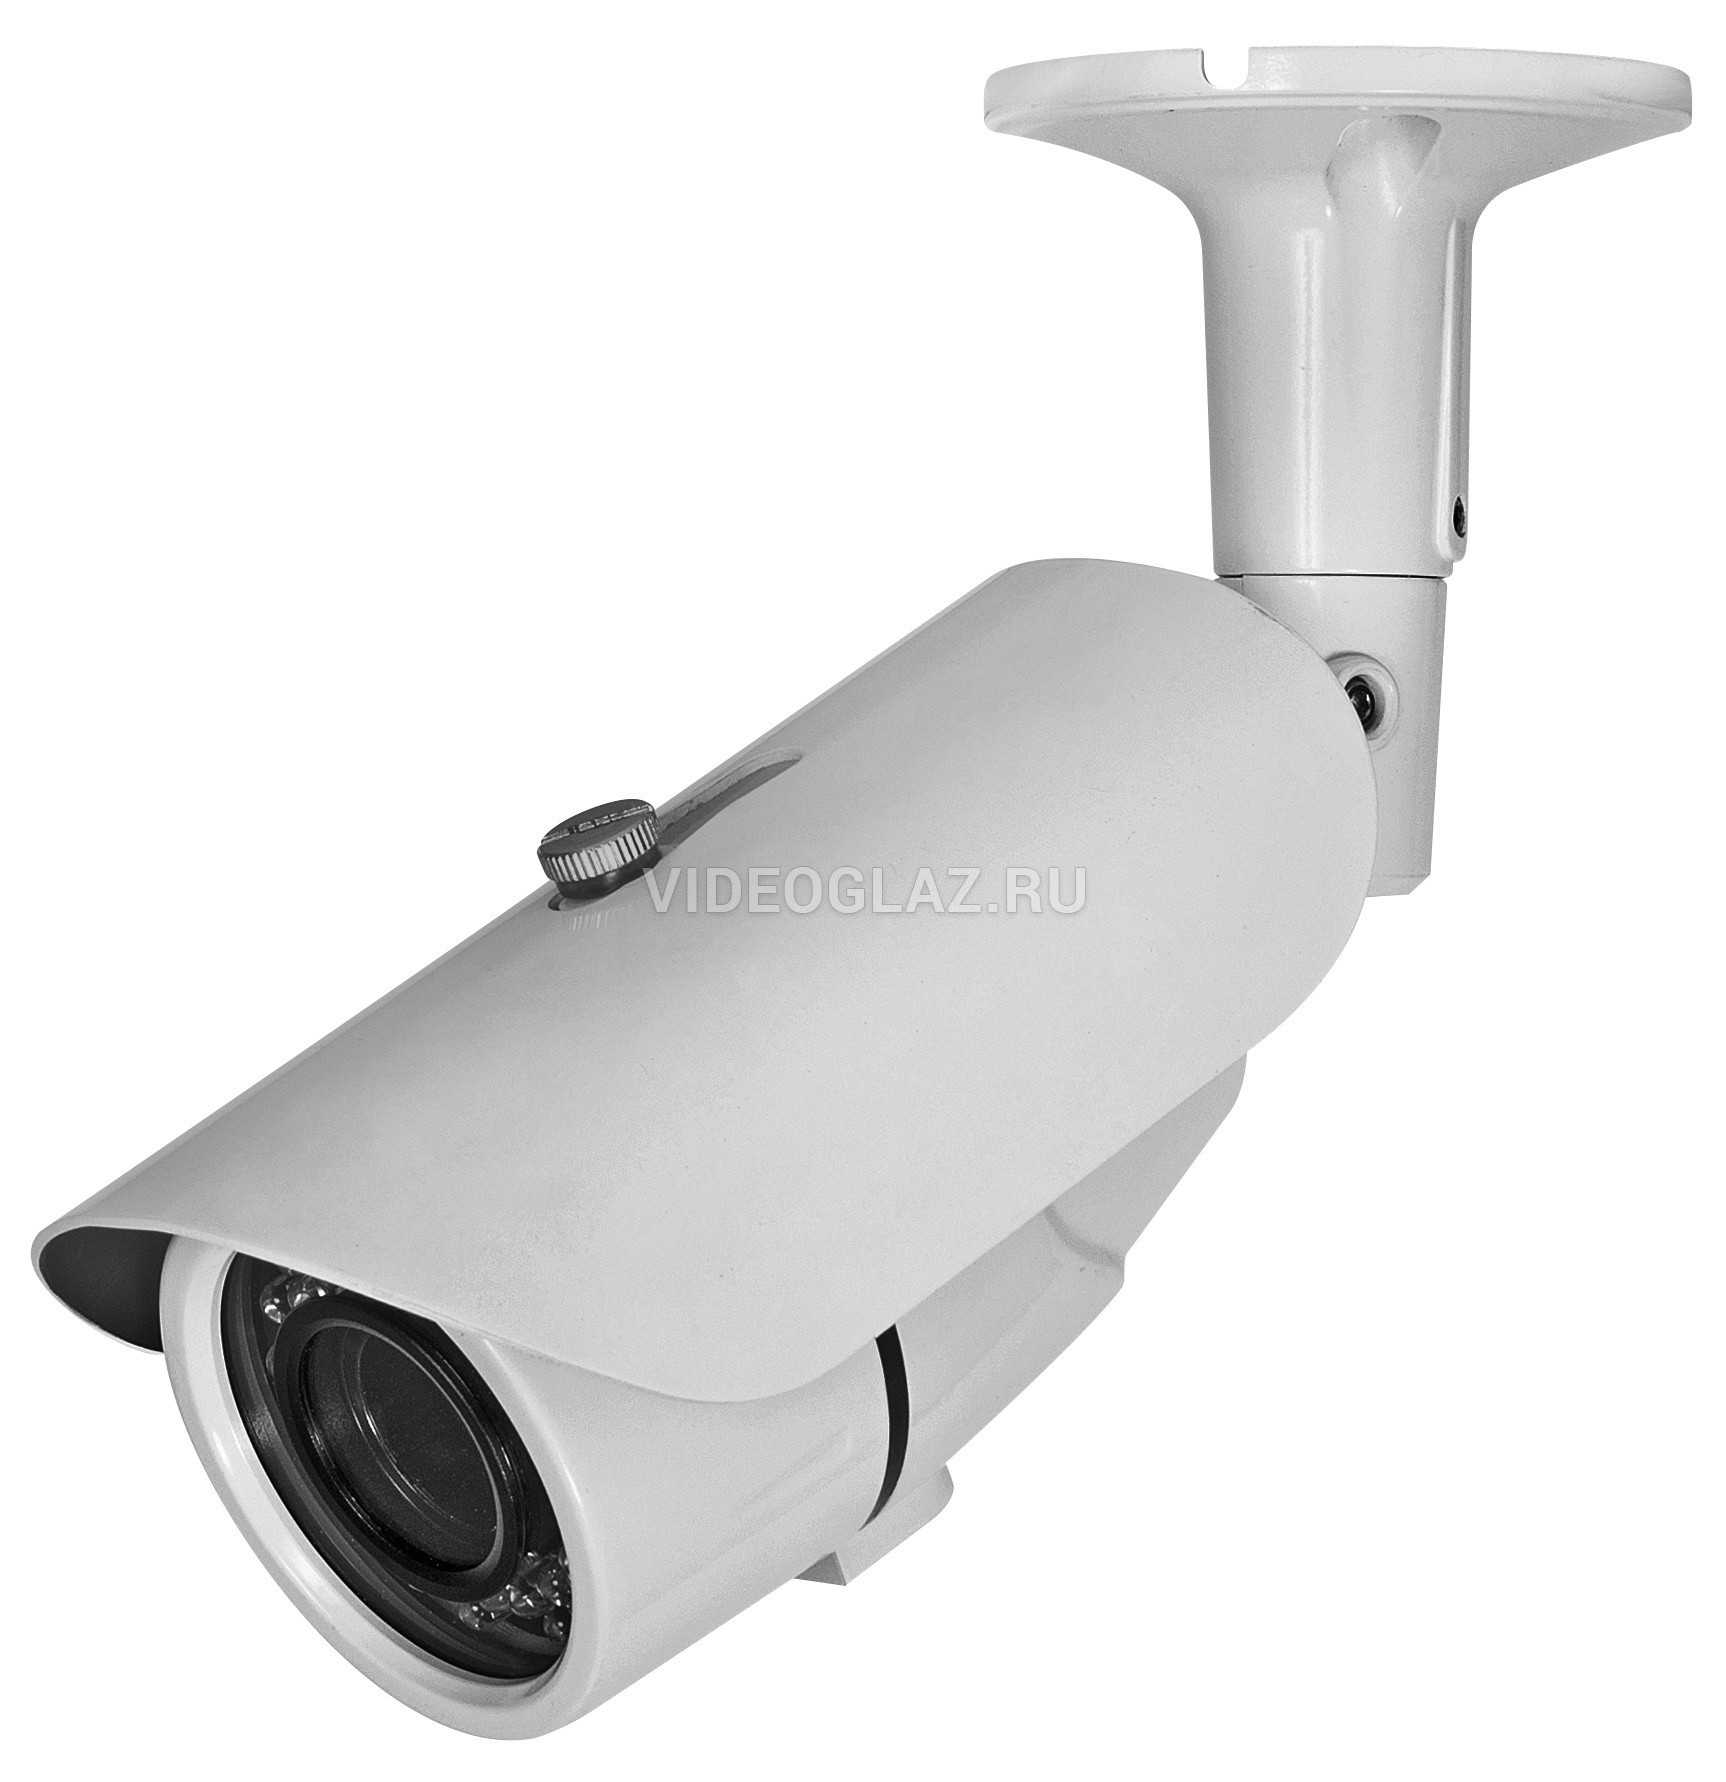 Видеокамера Smartec STC-HDT3624/1 ULTIMATE